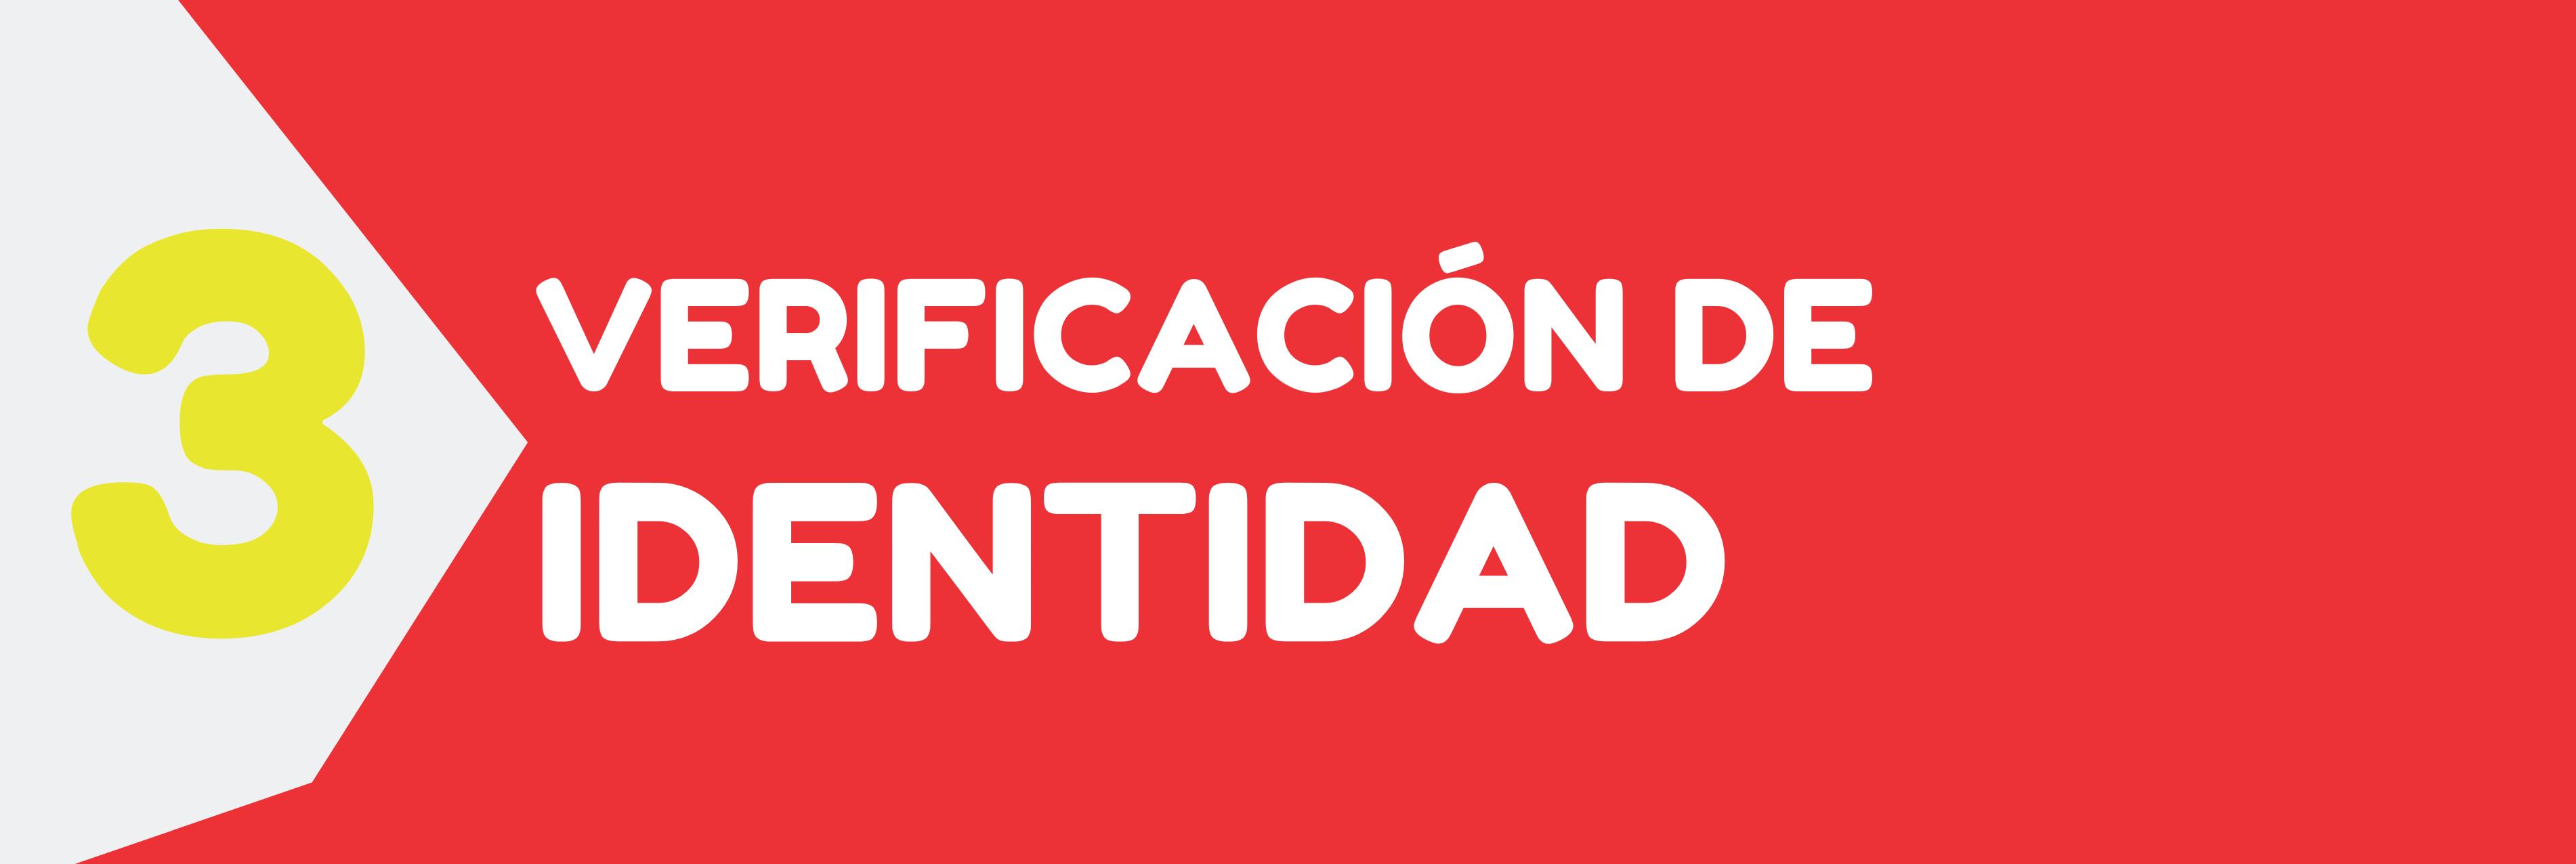 http://ccmagangue.org.co/media/imagenes/serviciosvirtuales/verificaciondeidentidad